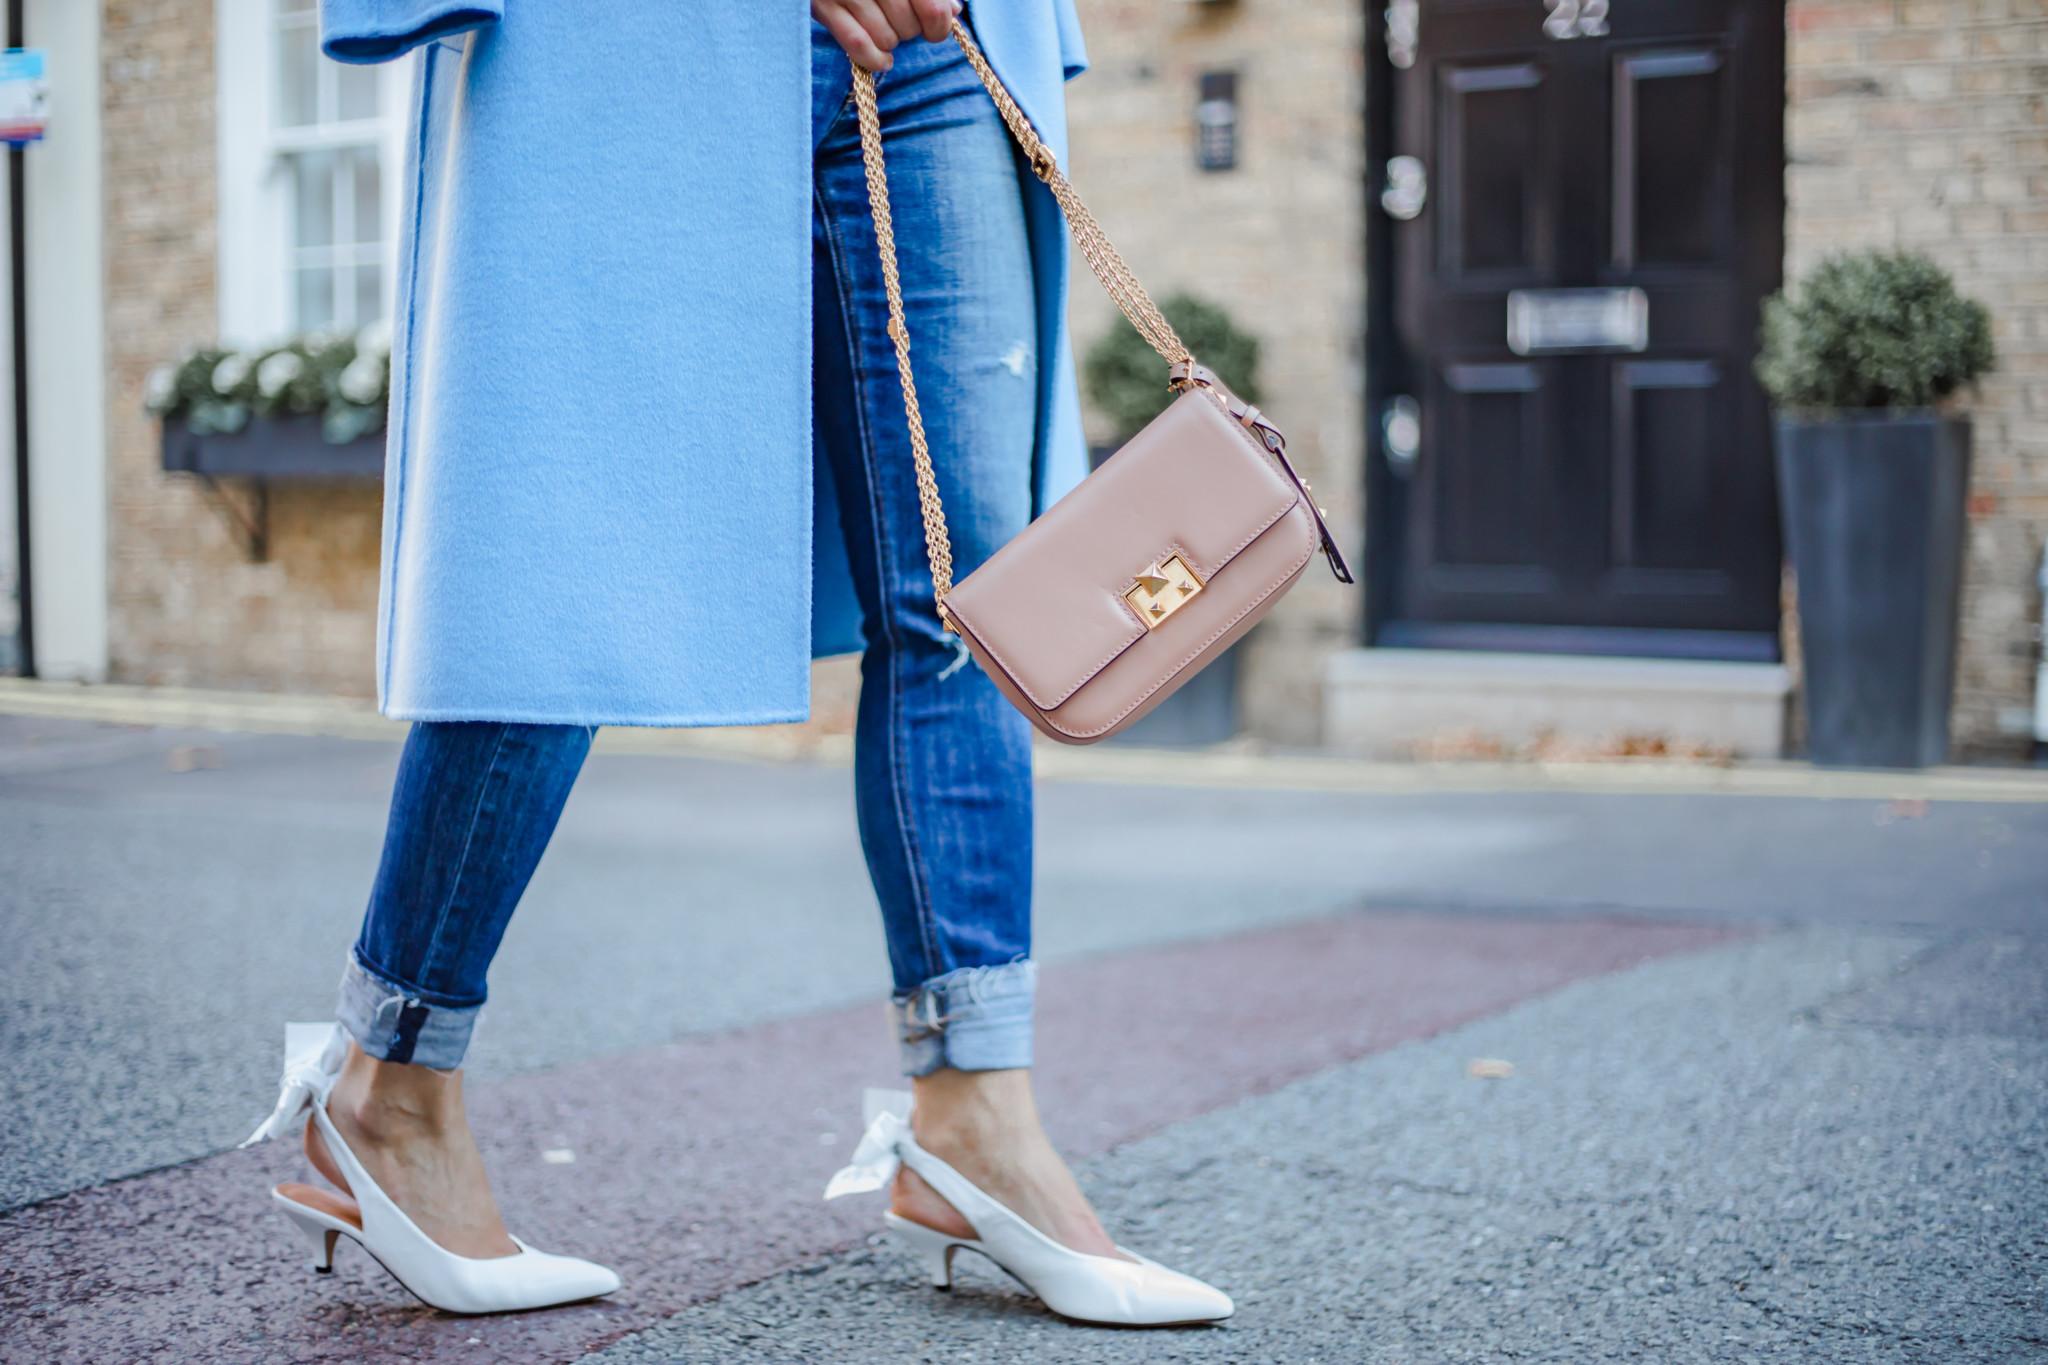 White slingback shoes, Valentino Rockstud bag